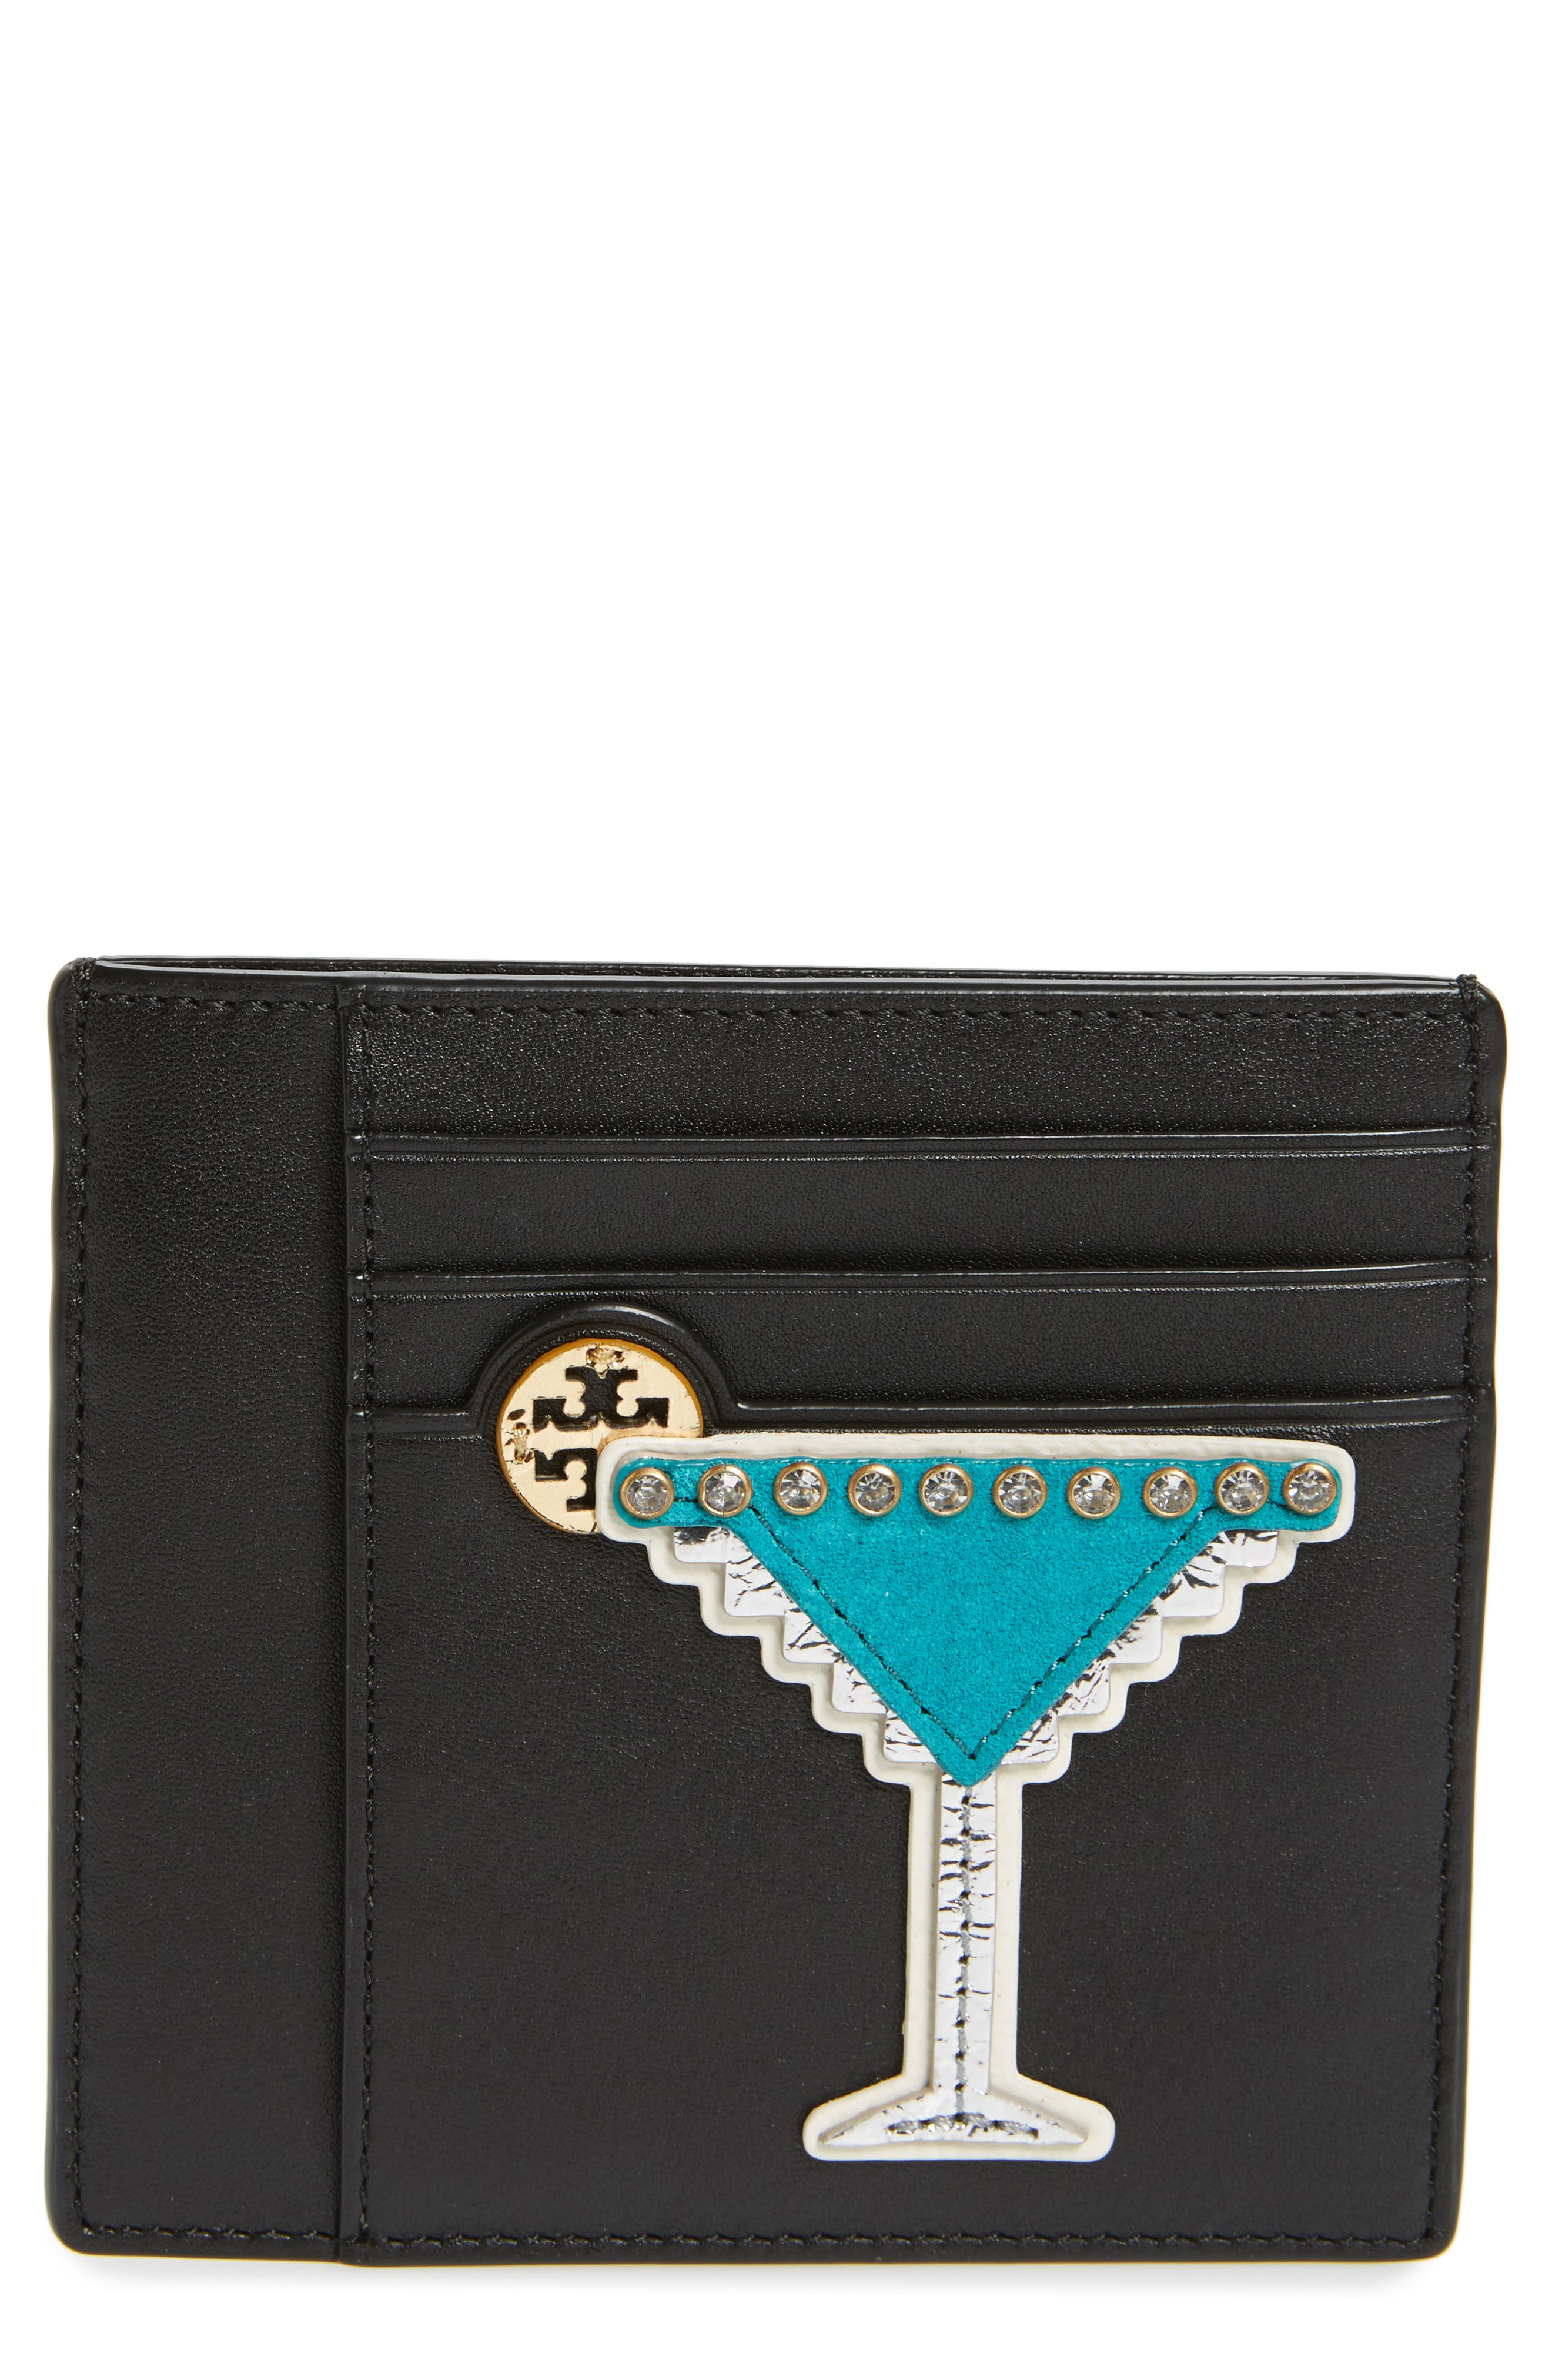 Main Image - Tory Burch Martini Appliqué Leather Card Case